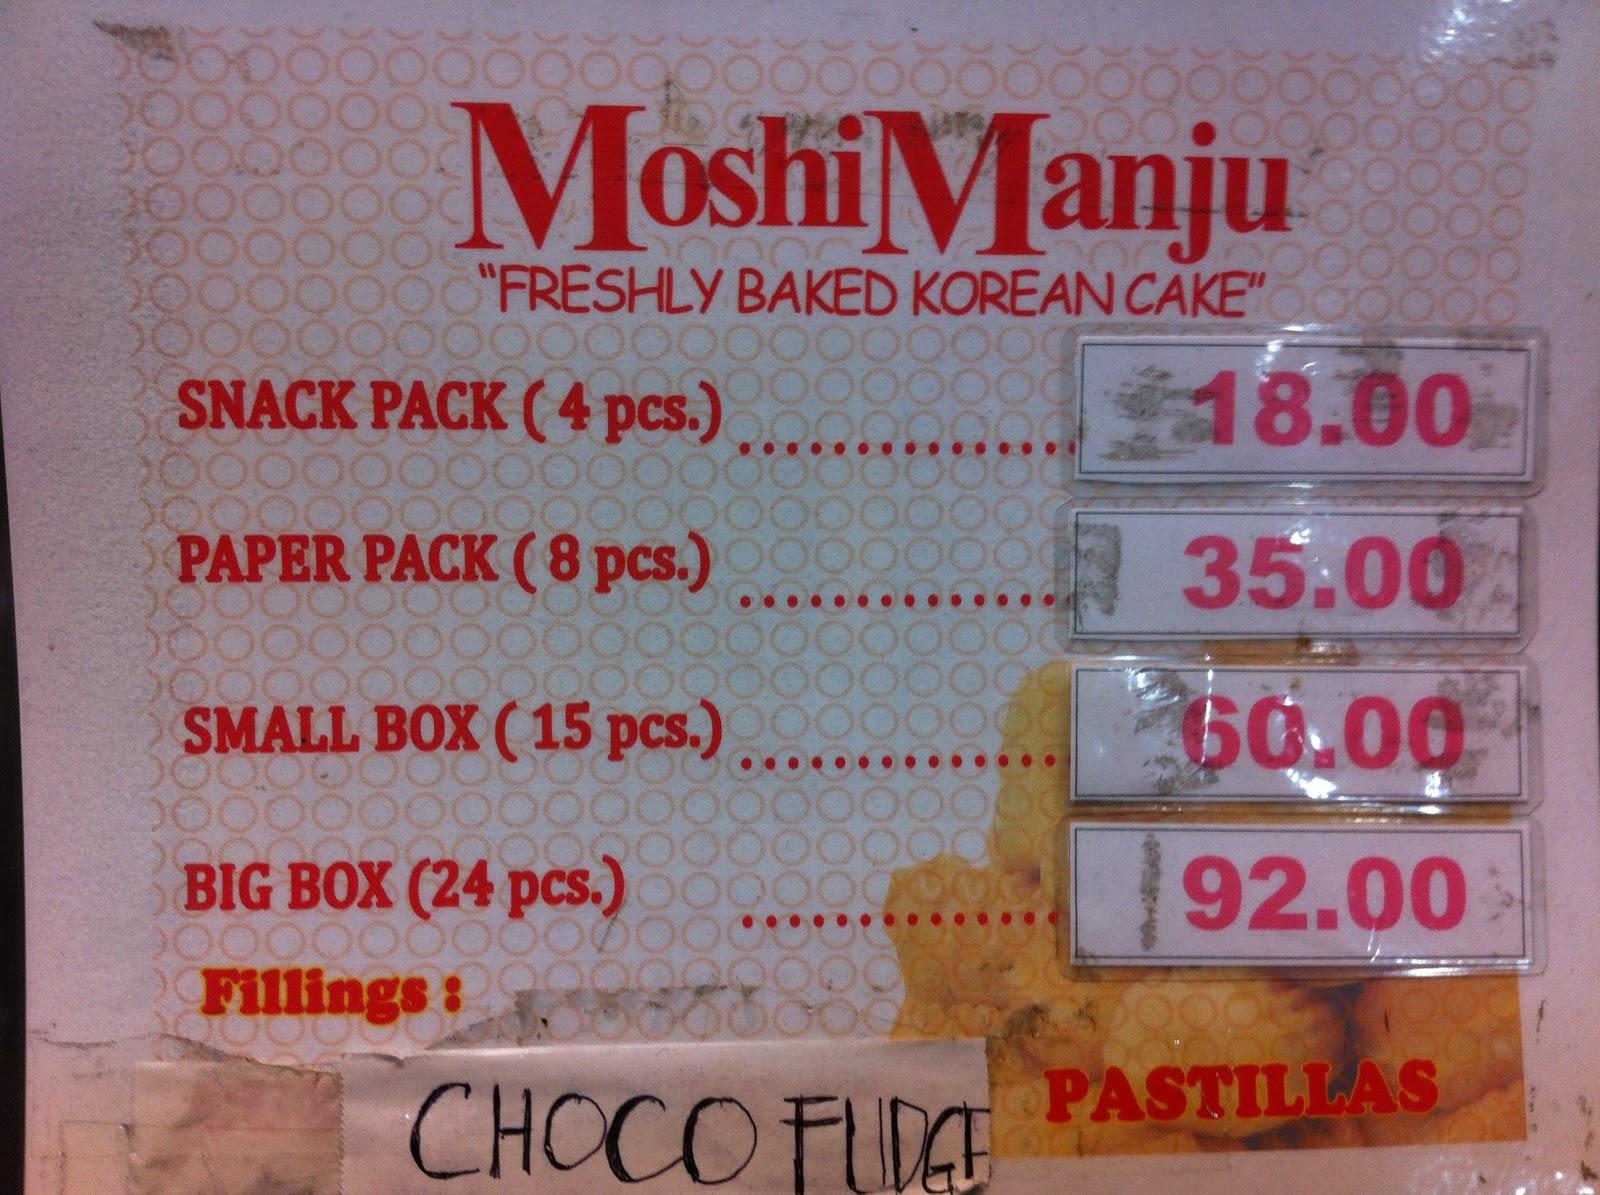 Rodillas Yema Cake Price List